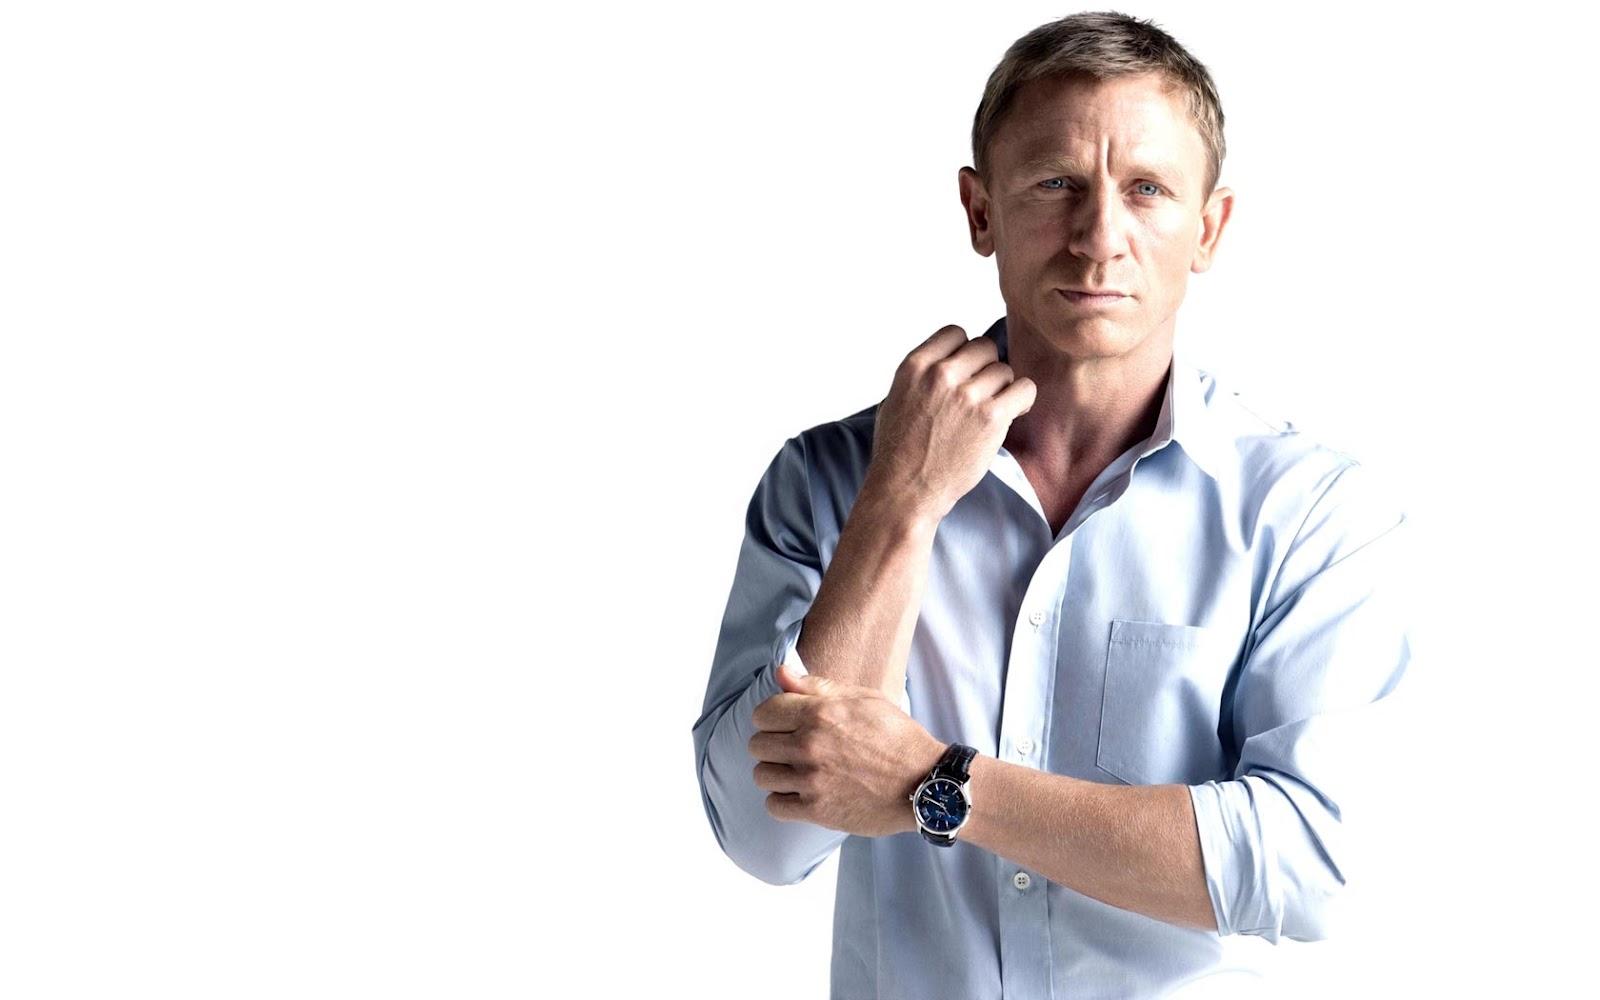 DANIEL CRAIG HOLLYWOOD ACTOR, JAMES BOND 007 | CELEBRITY ...